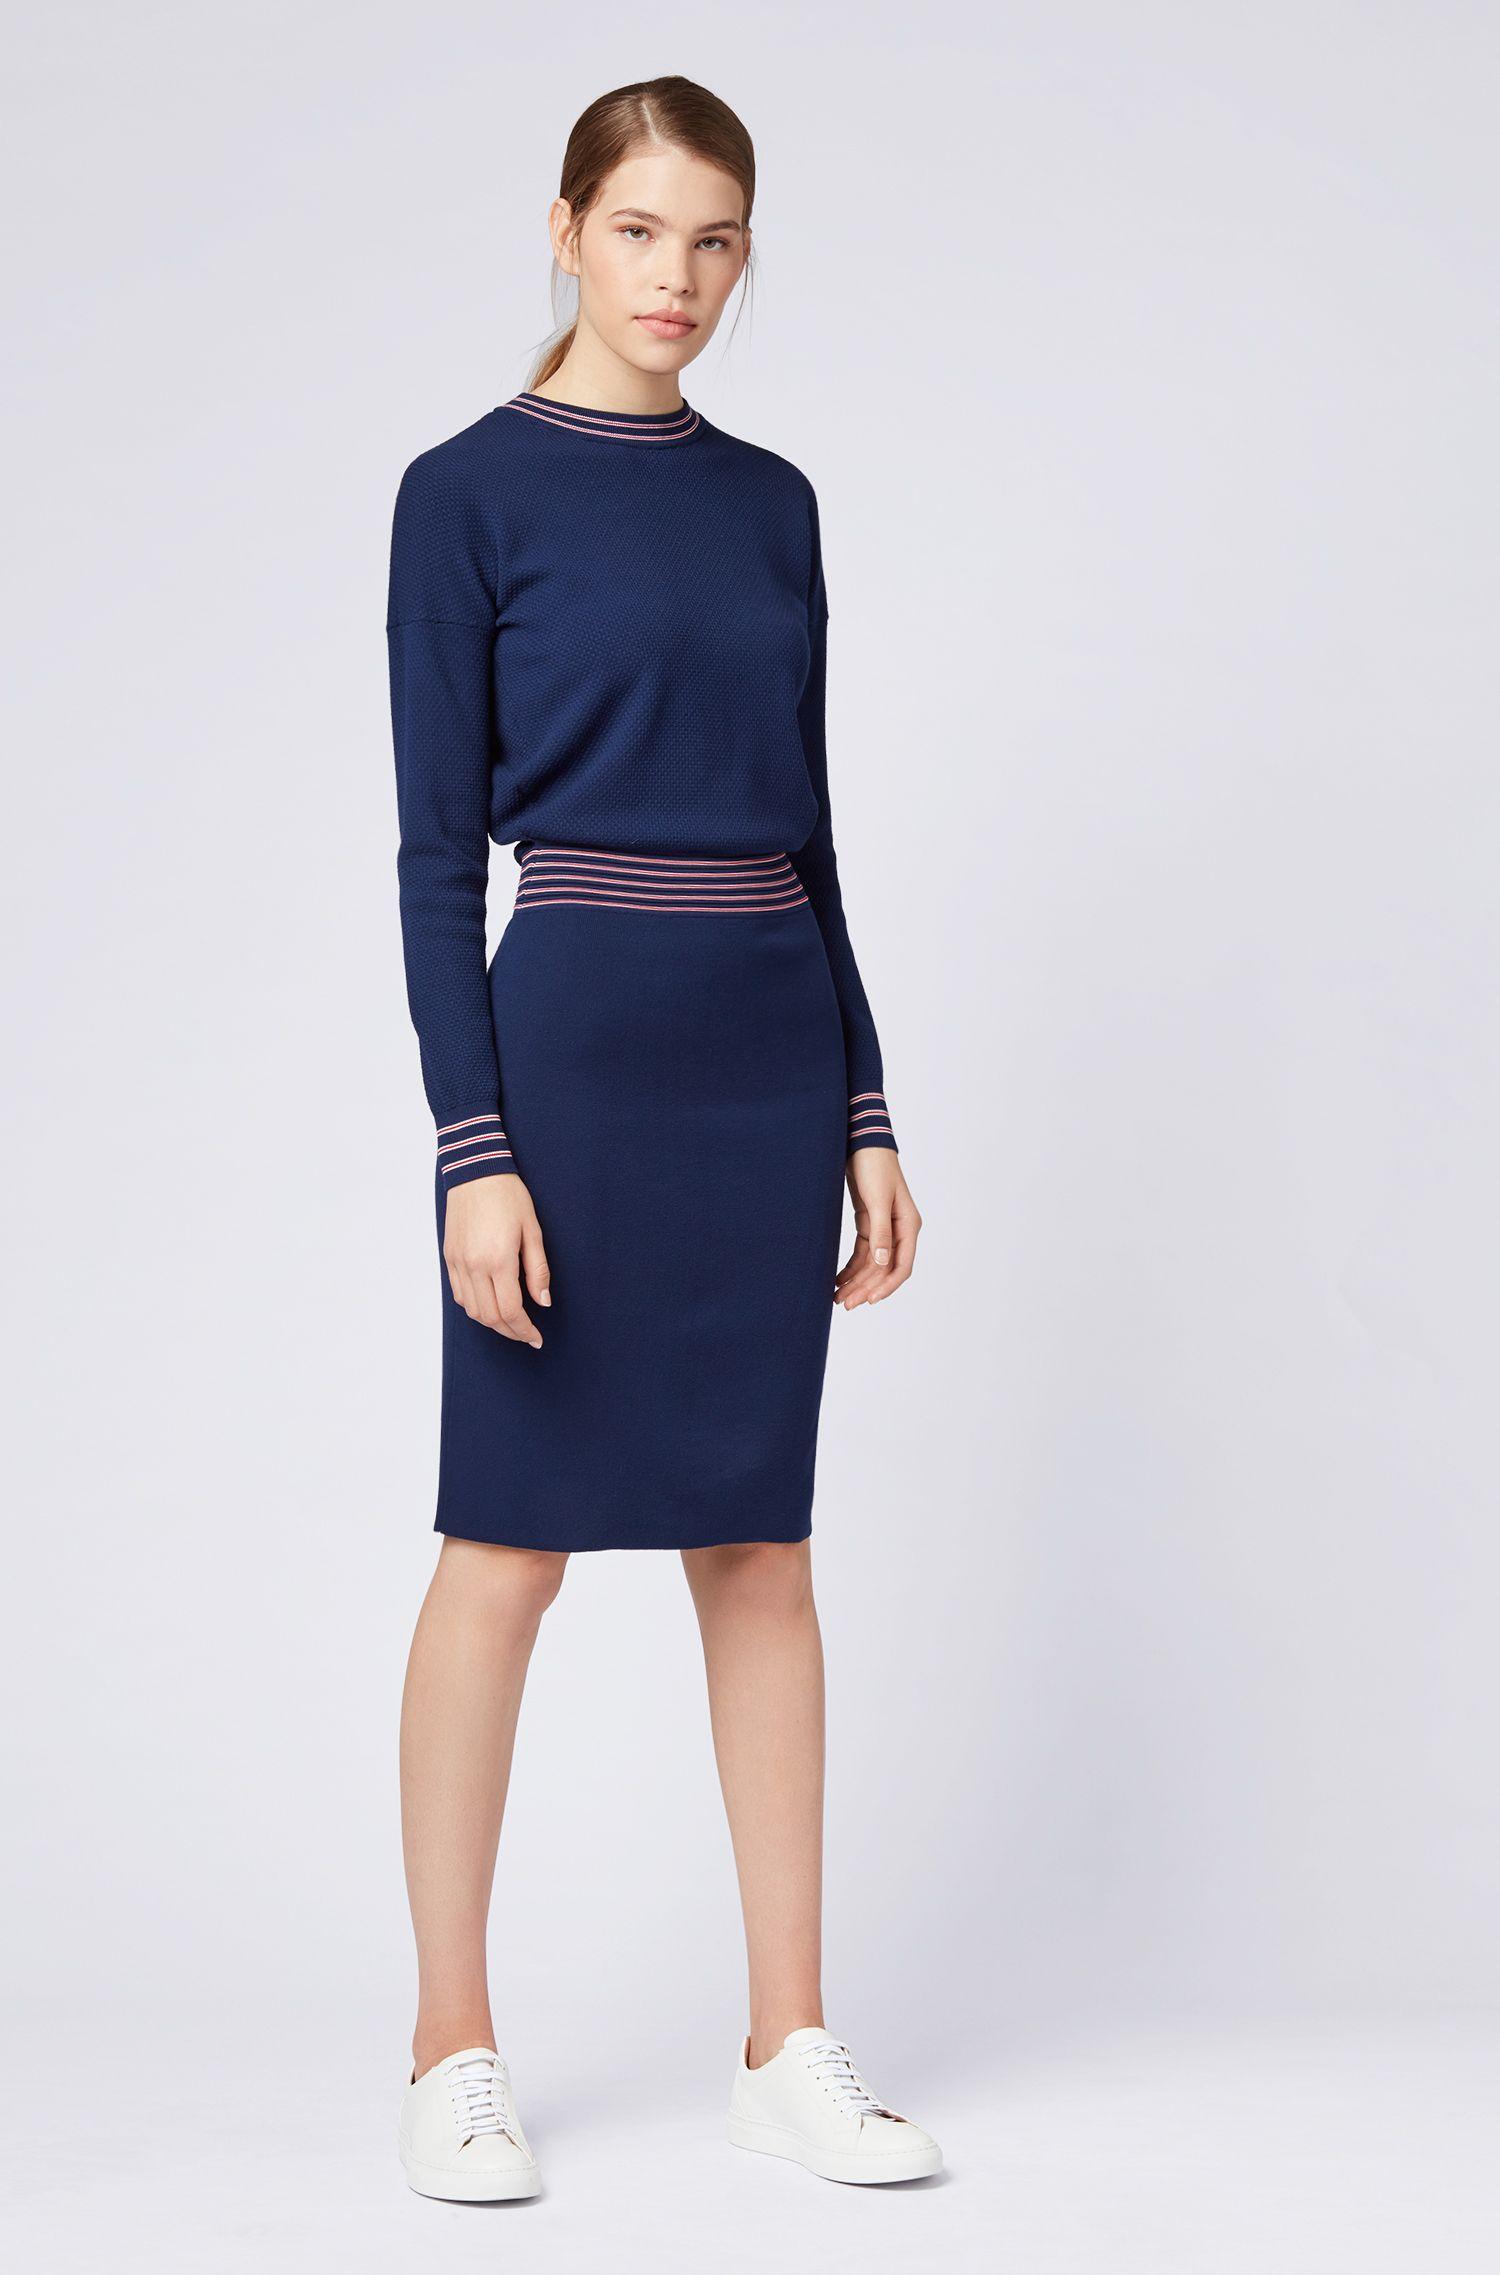 Gebreide jurk met lange mouwen van stretchmateriaal, Donkerblauw